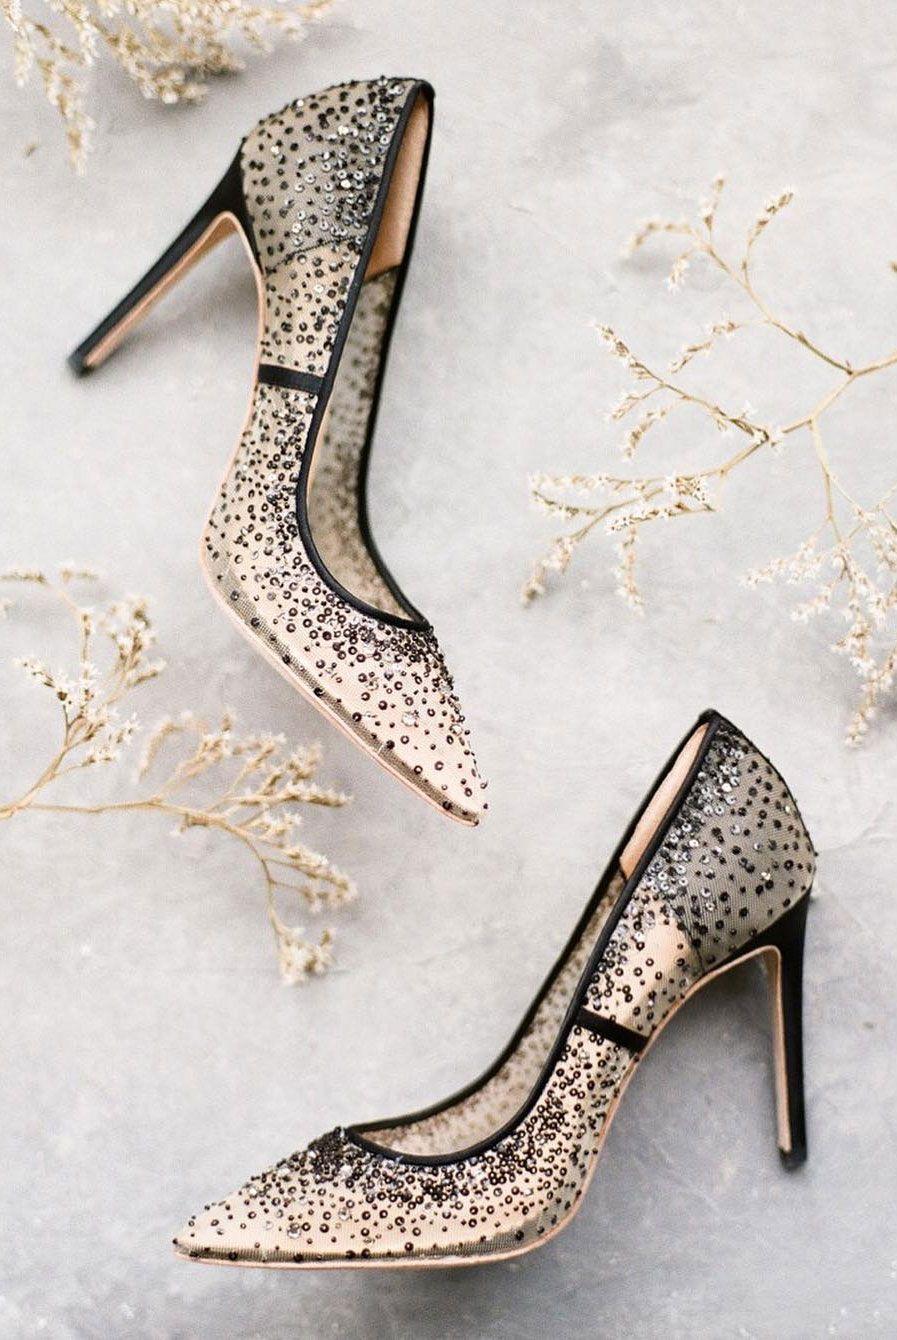 Sheer black heels with crystal embellishment, wedding shoes, wedding heels, bridal heels ,sheer black heels